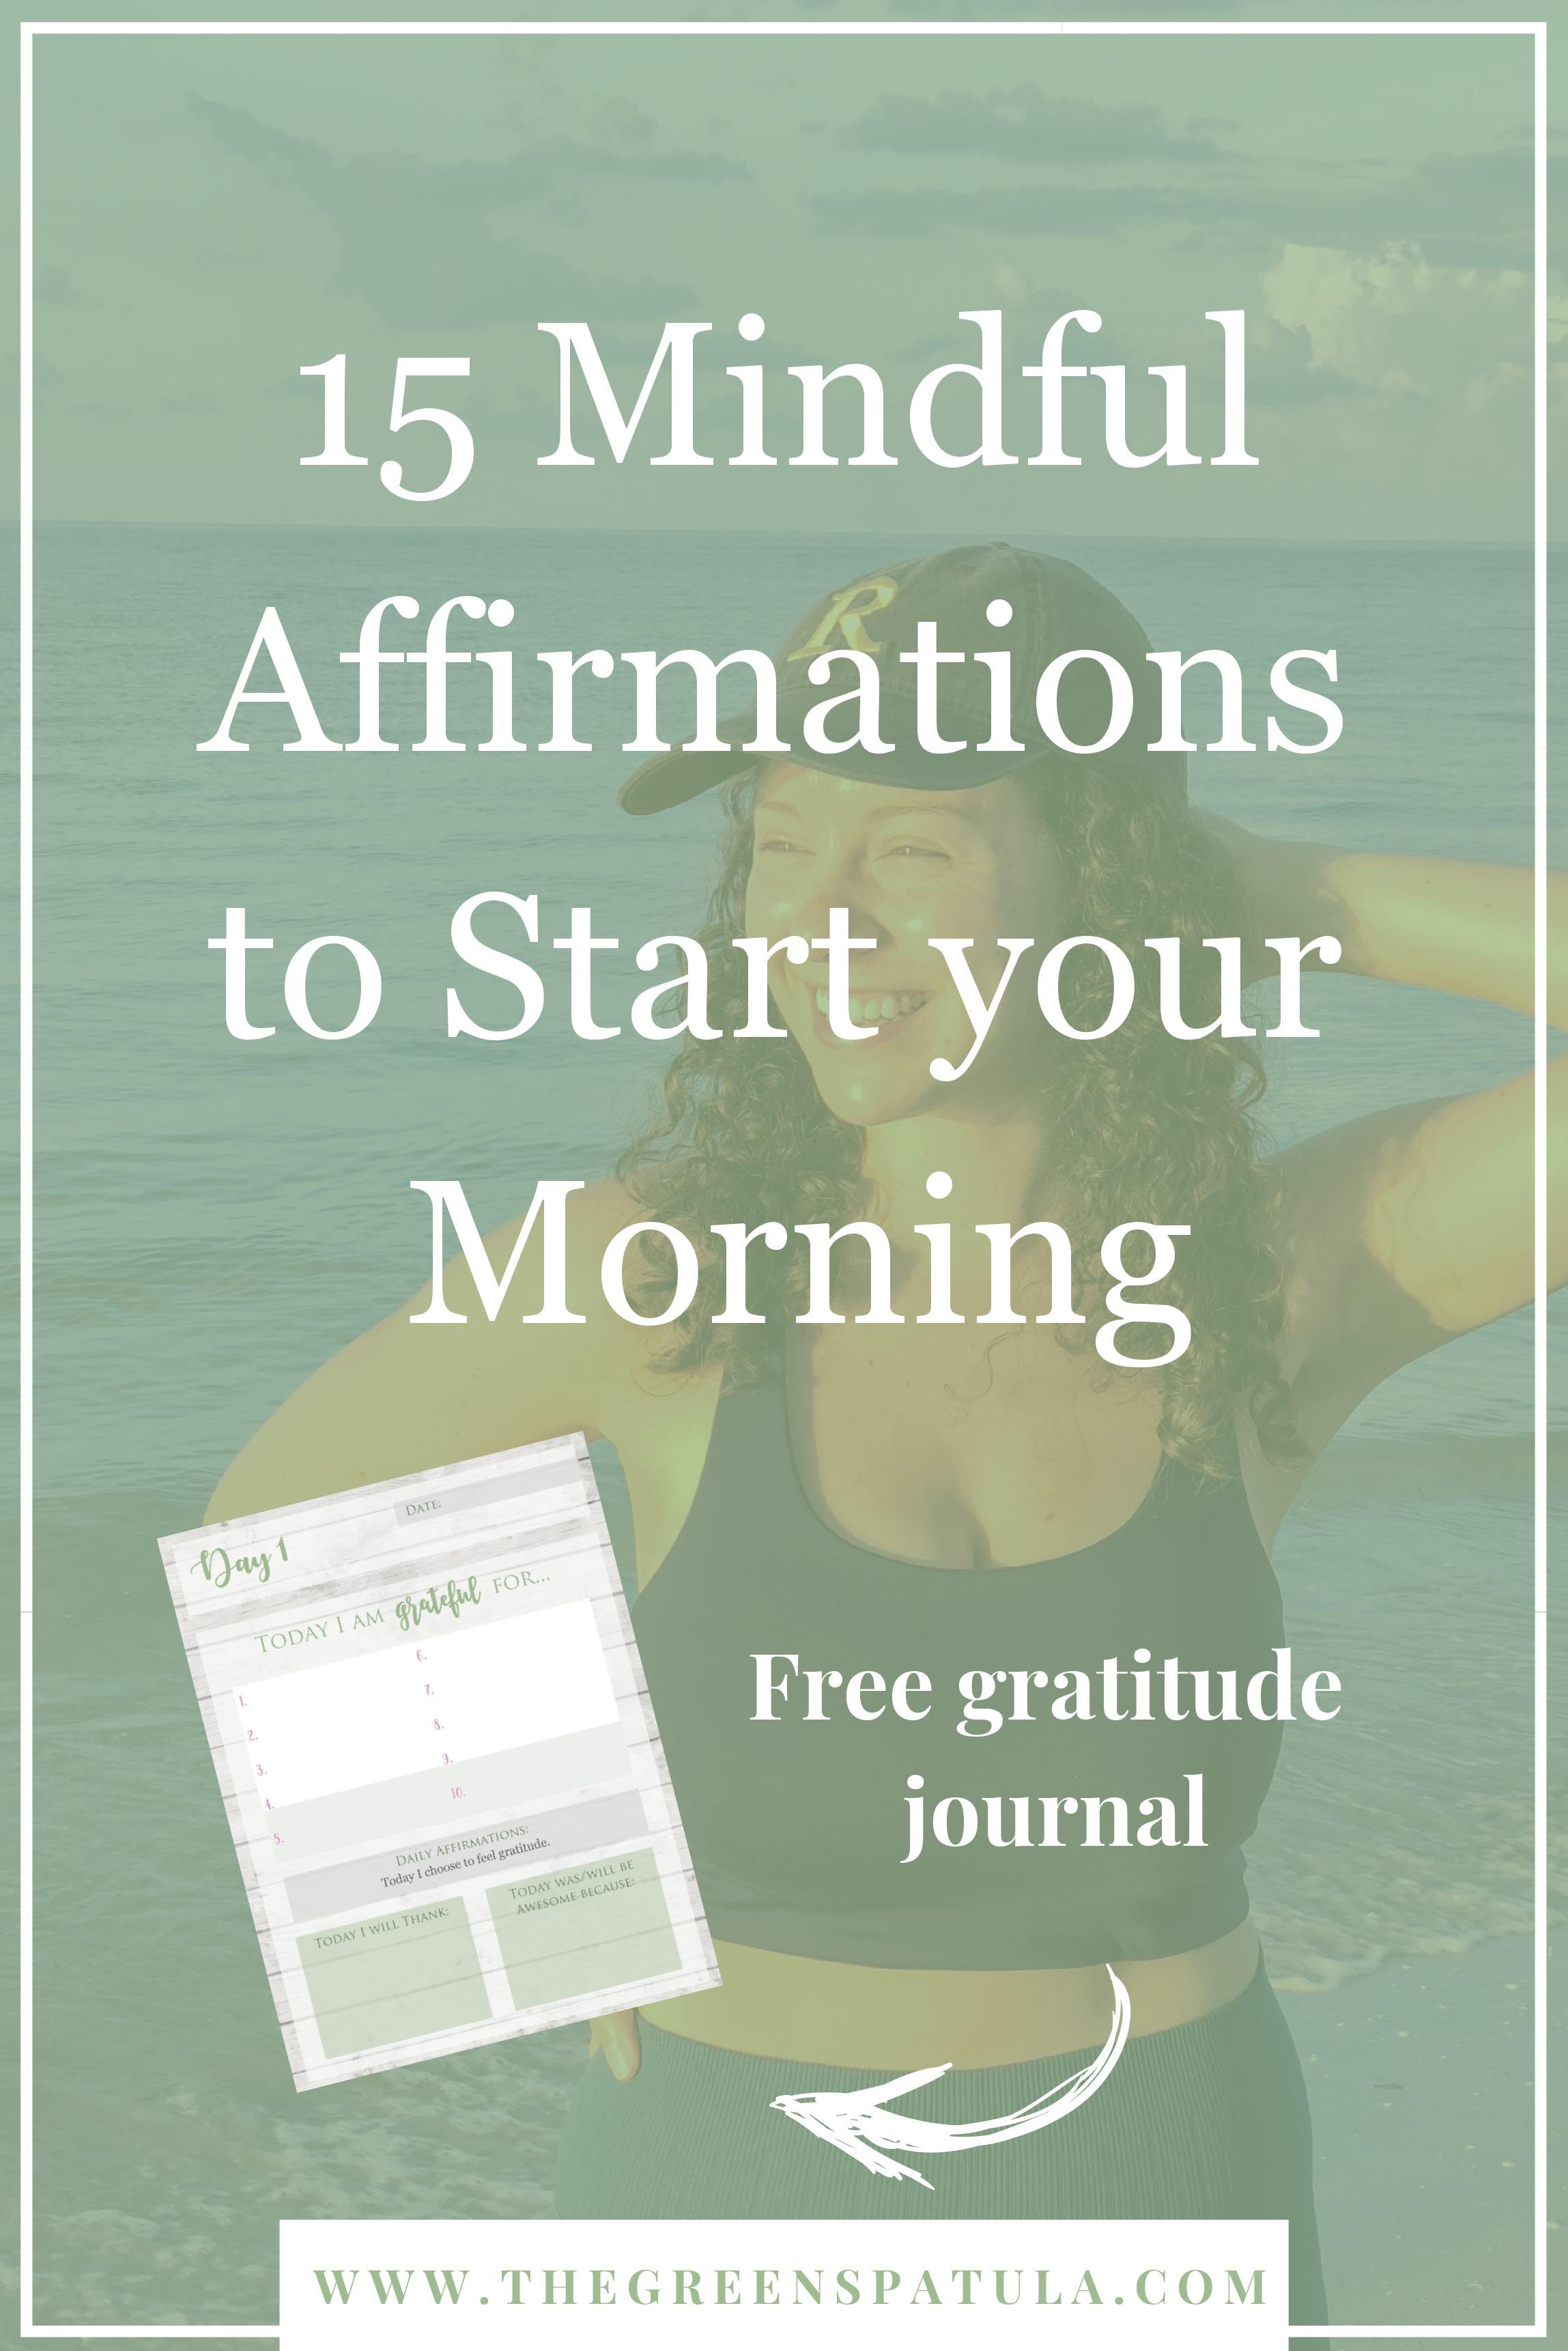 mindfulness-affirmations-morning-gratitude-plant-based-vegan-health.jpg